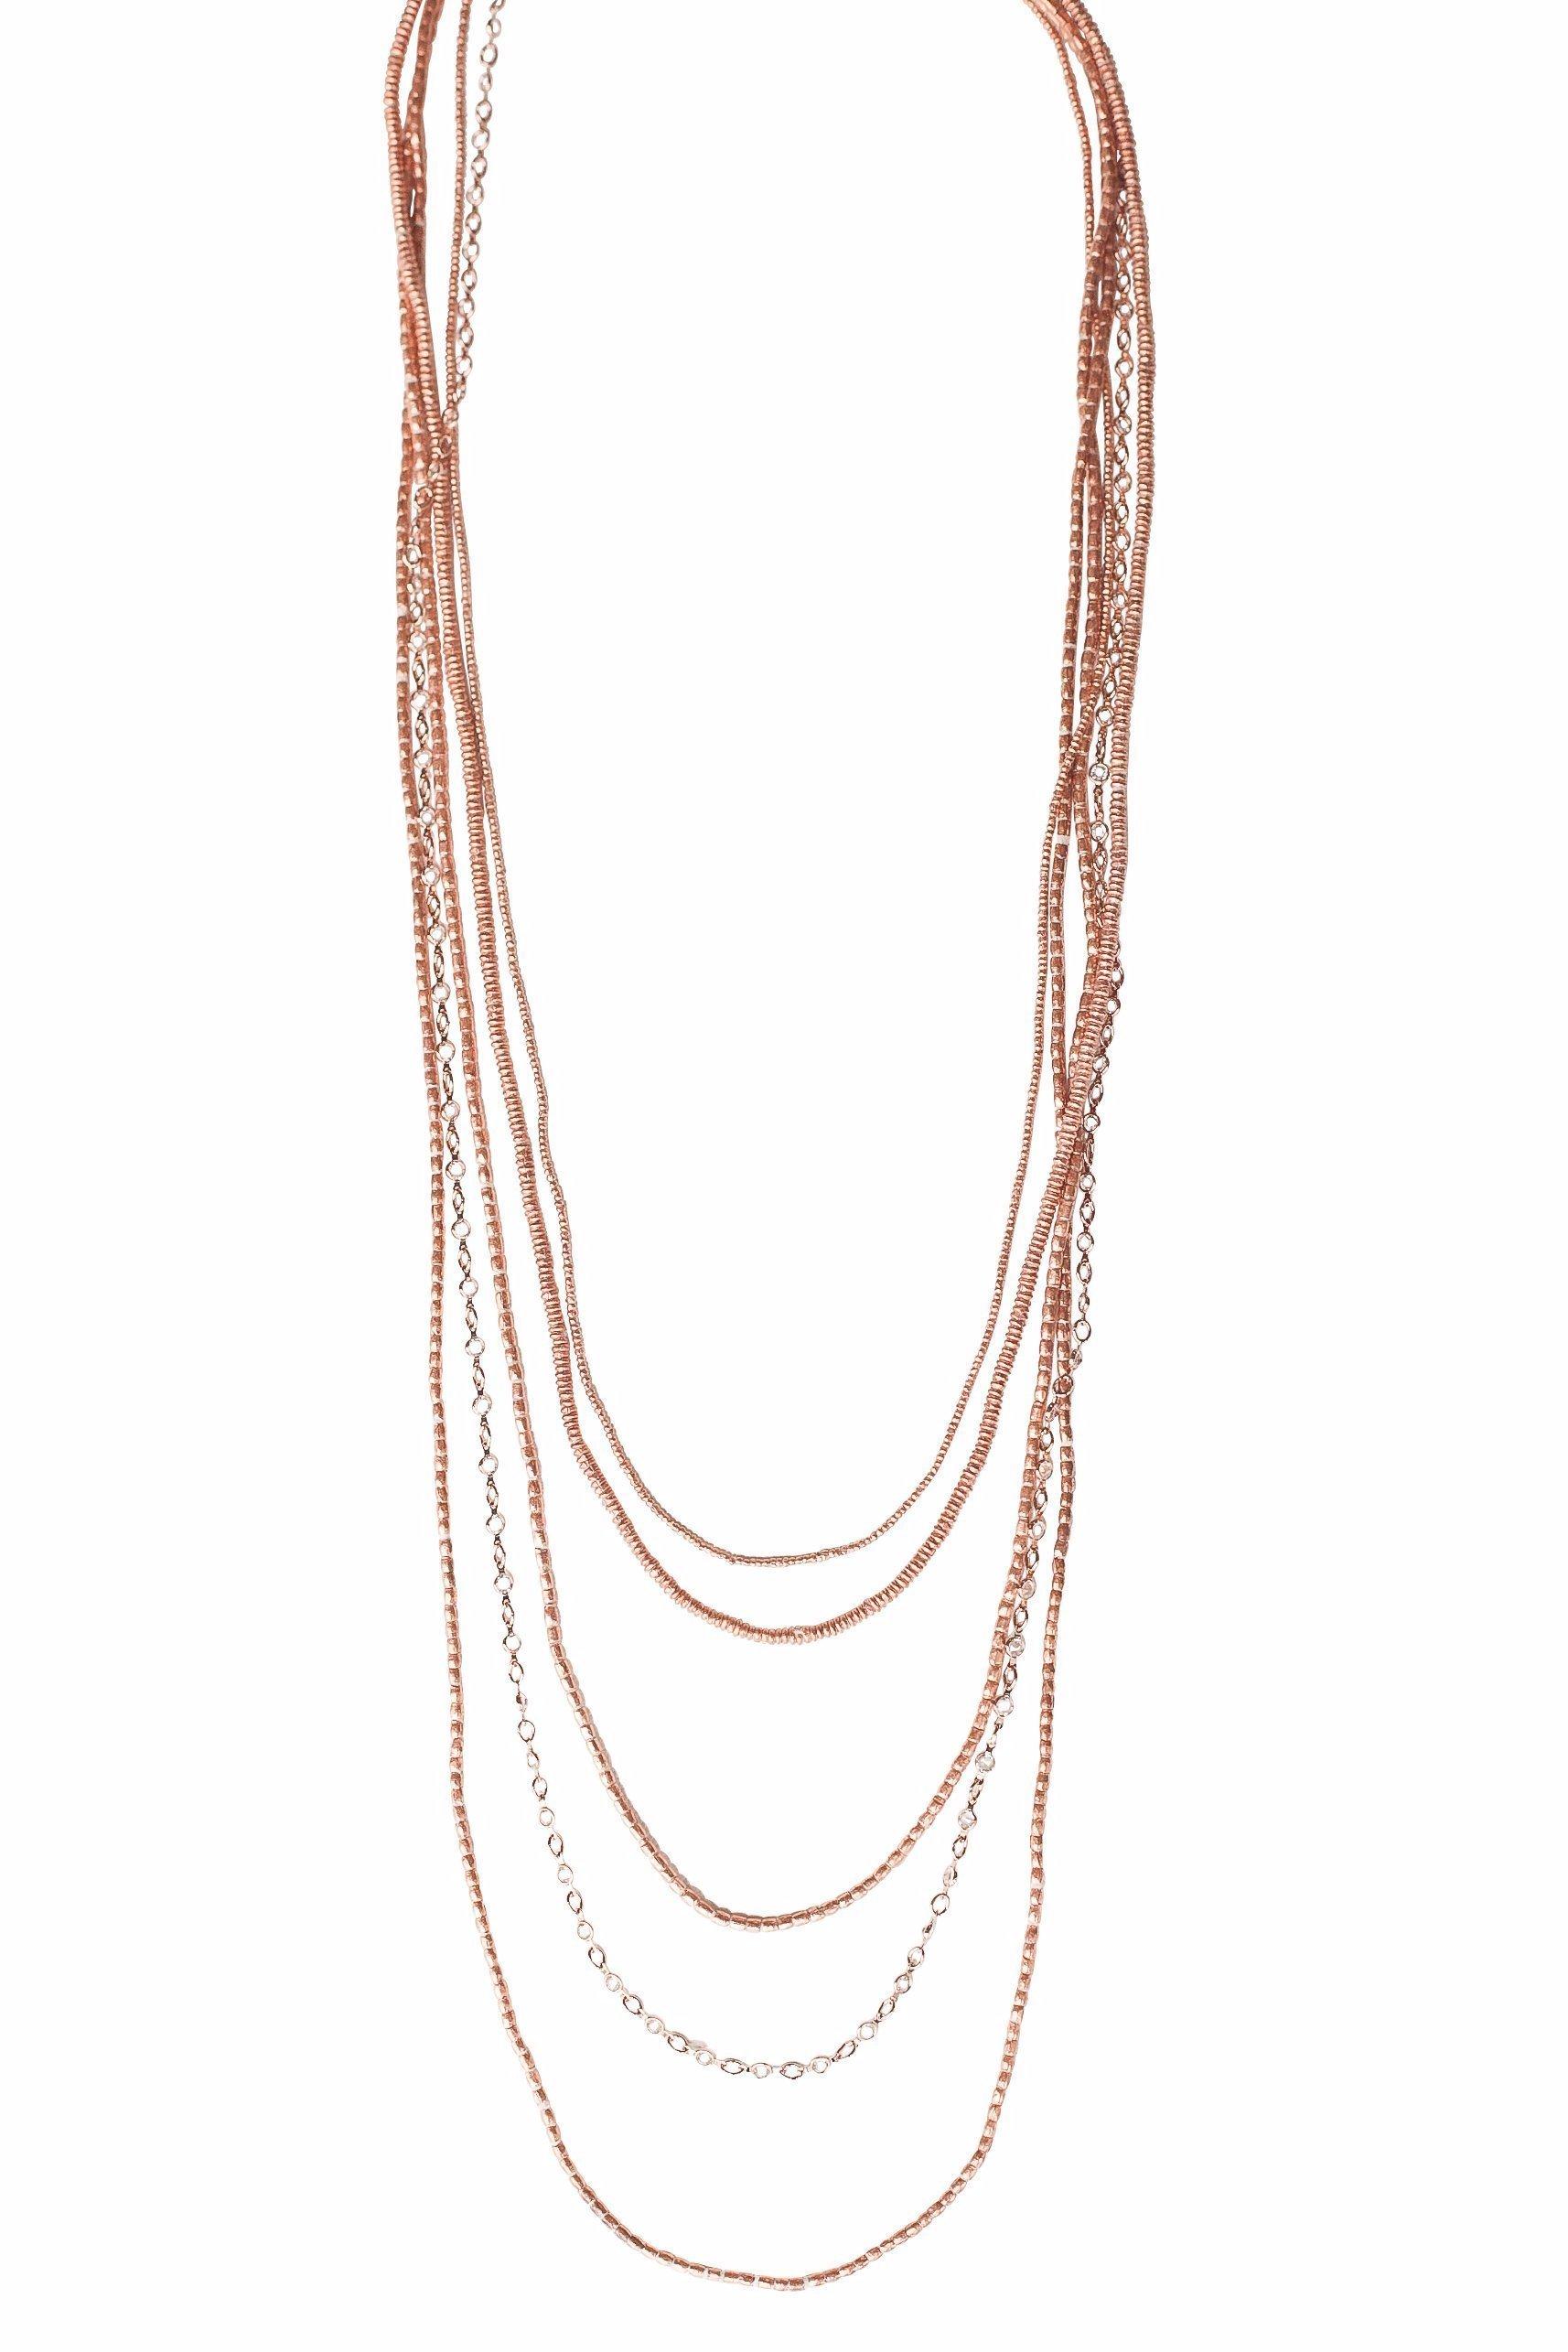 Heather Gardner - 5 Layer Petite Crystal Ethiopian Necklace Rose Gold